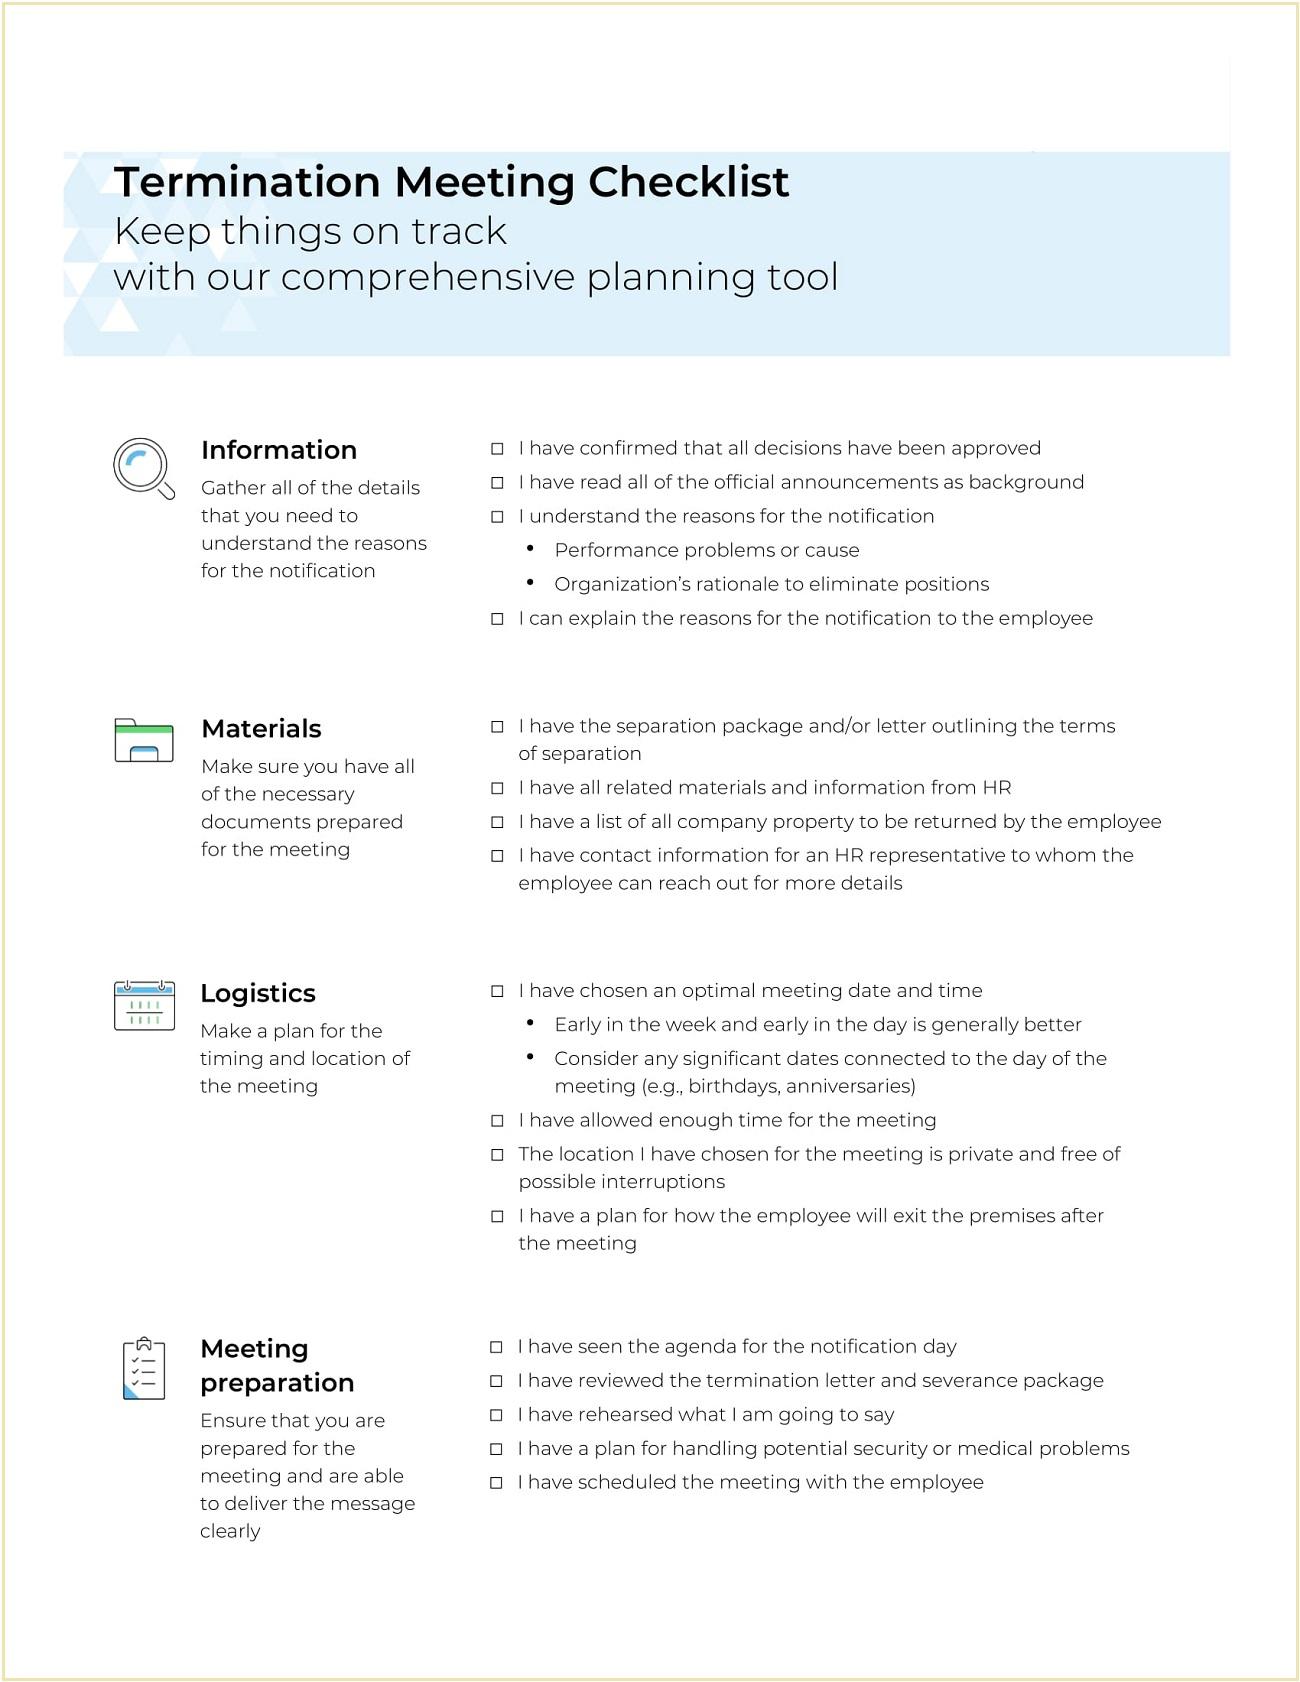 Termination Meeting Checklist Word